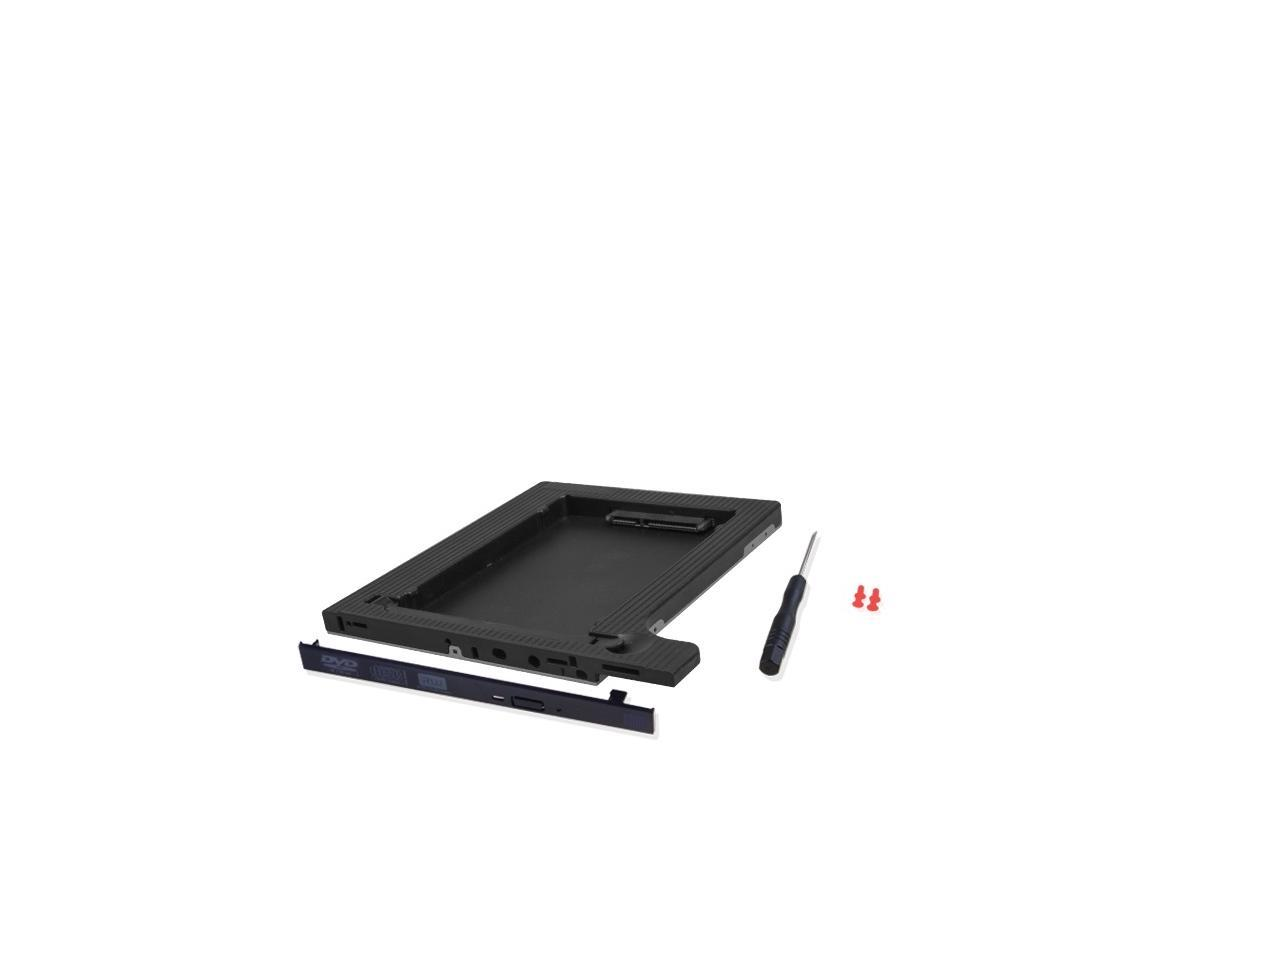 USB 2.0 External CD//DVD Drive for Acer aspire 5732zg